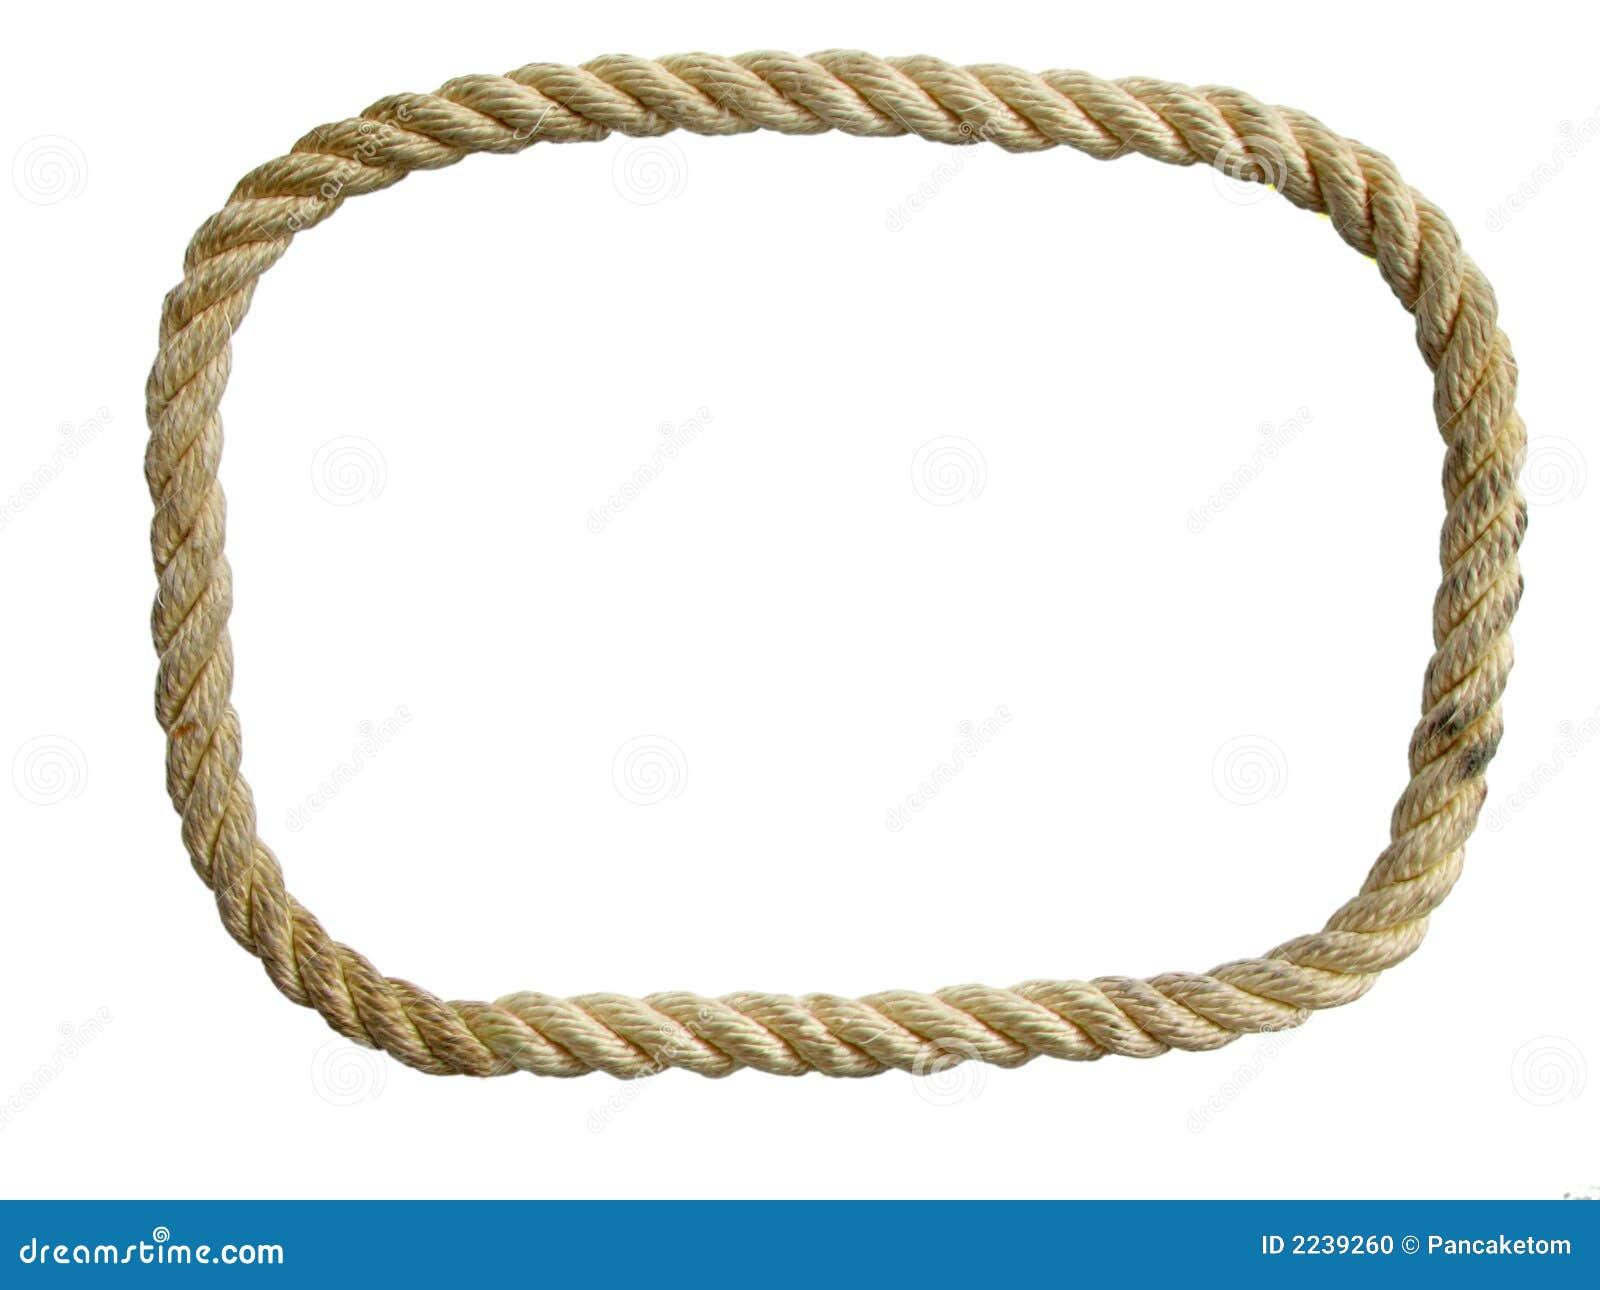 Endless used nylon rope loop isolated on white background.